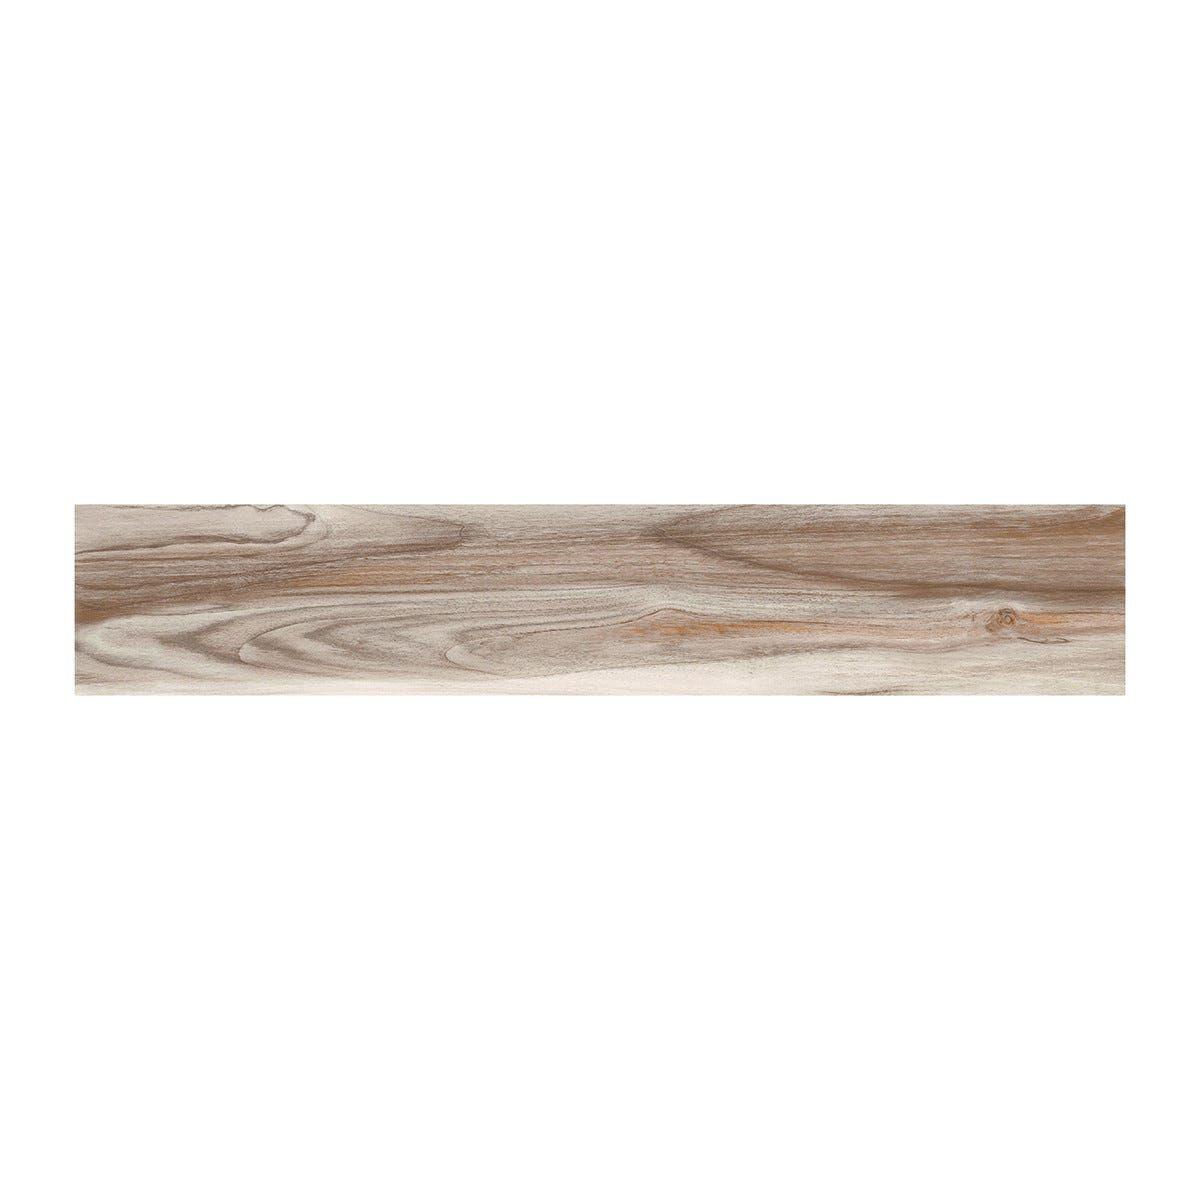 ELLE_CERAMICS Pavimento Interno Esterno Legno Shining Grey 14x83,5 Pei 4 R10 Gres Porcellanato